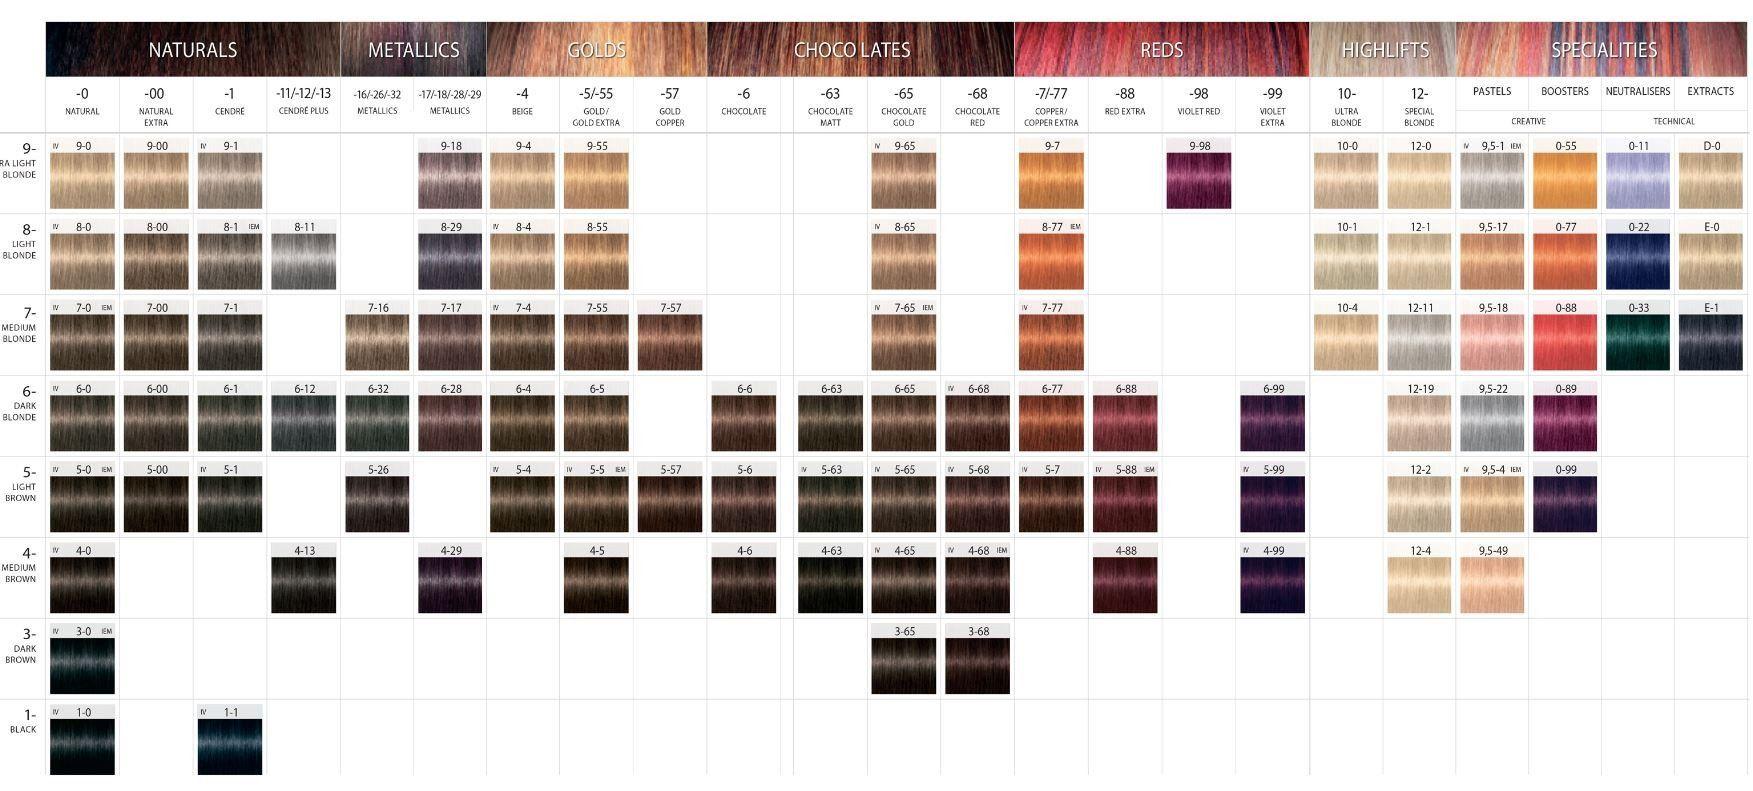 Schwarzkopf Igora Royal Chart Permanentn Color Use 2000x Jpg 1 753 791 Pixels Frisyrer Damast